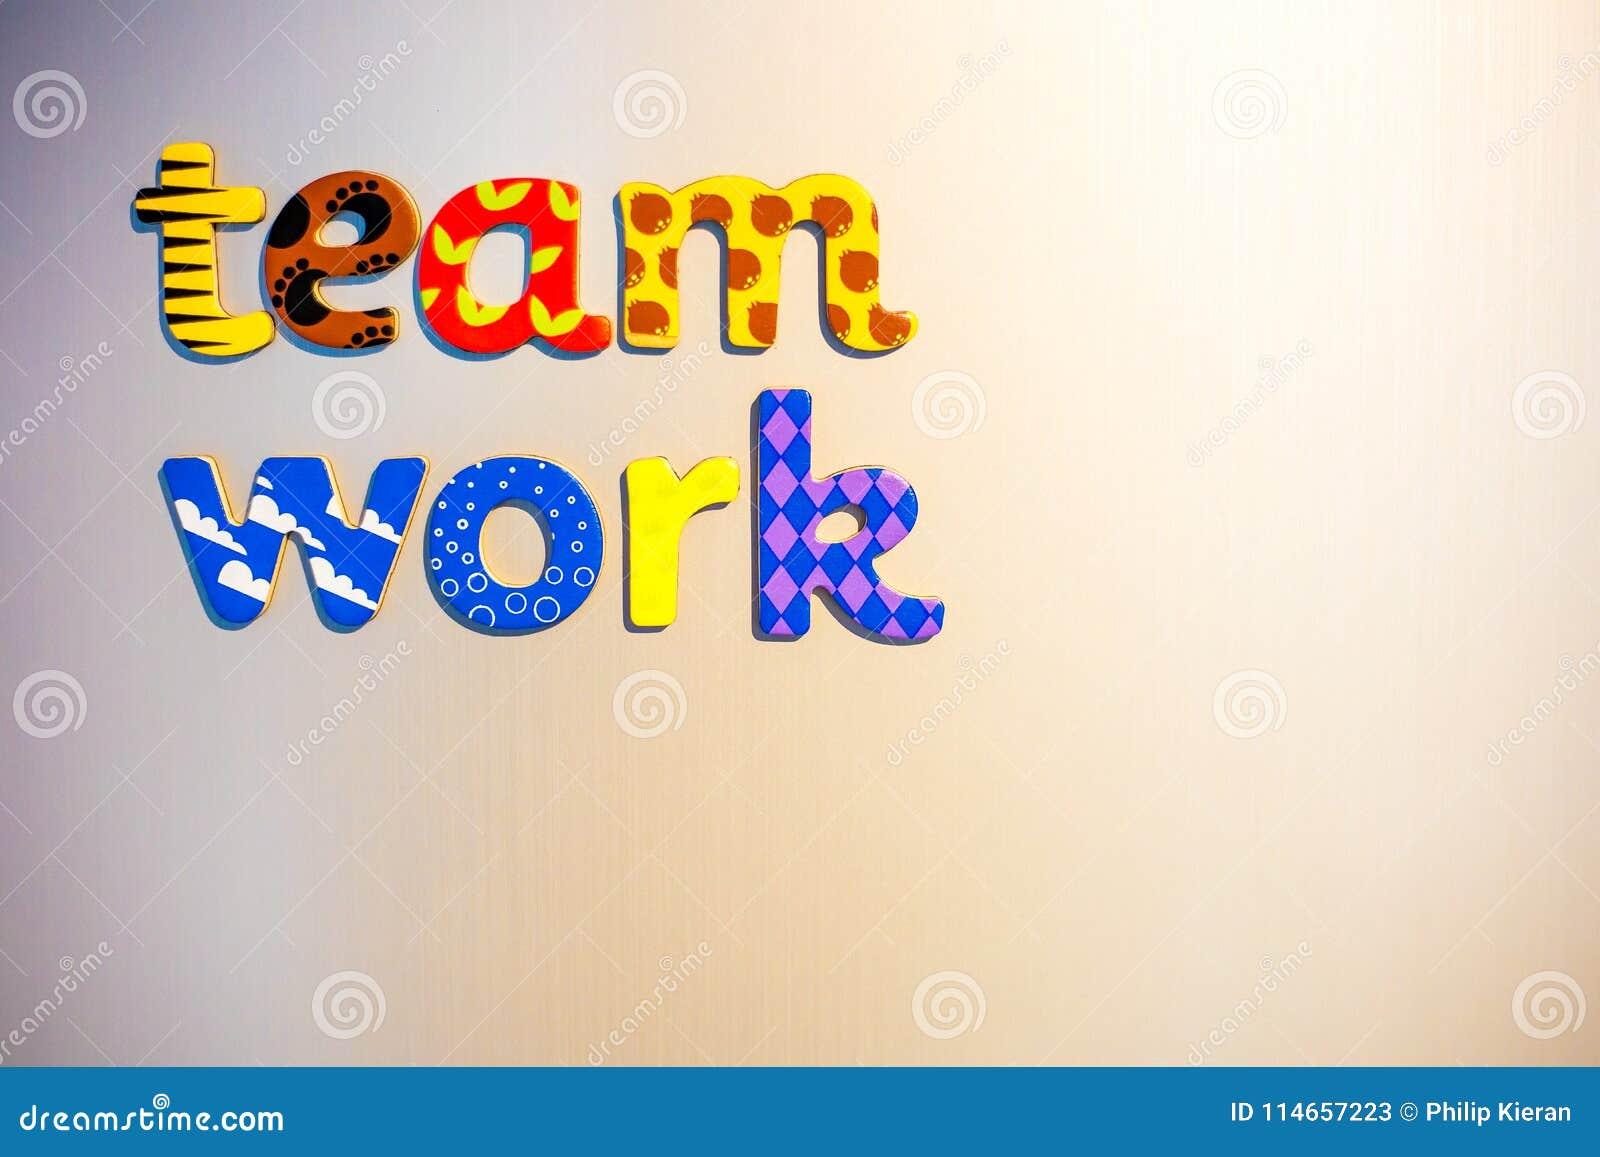 team work written in colourful fridge magnet letters